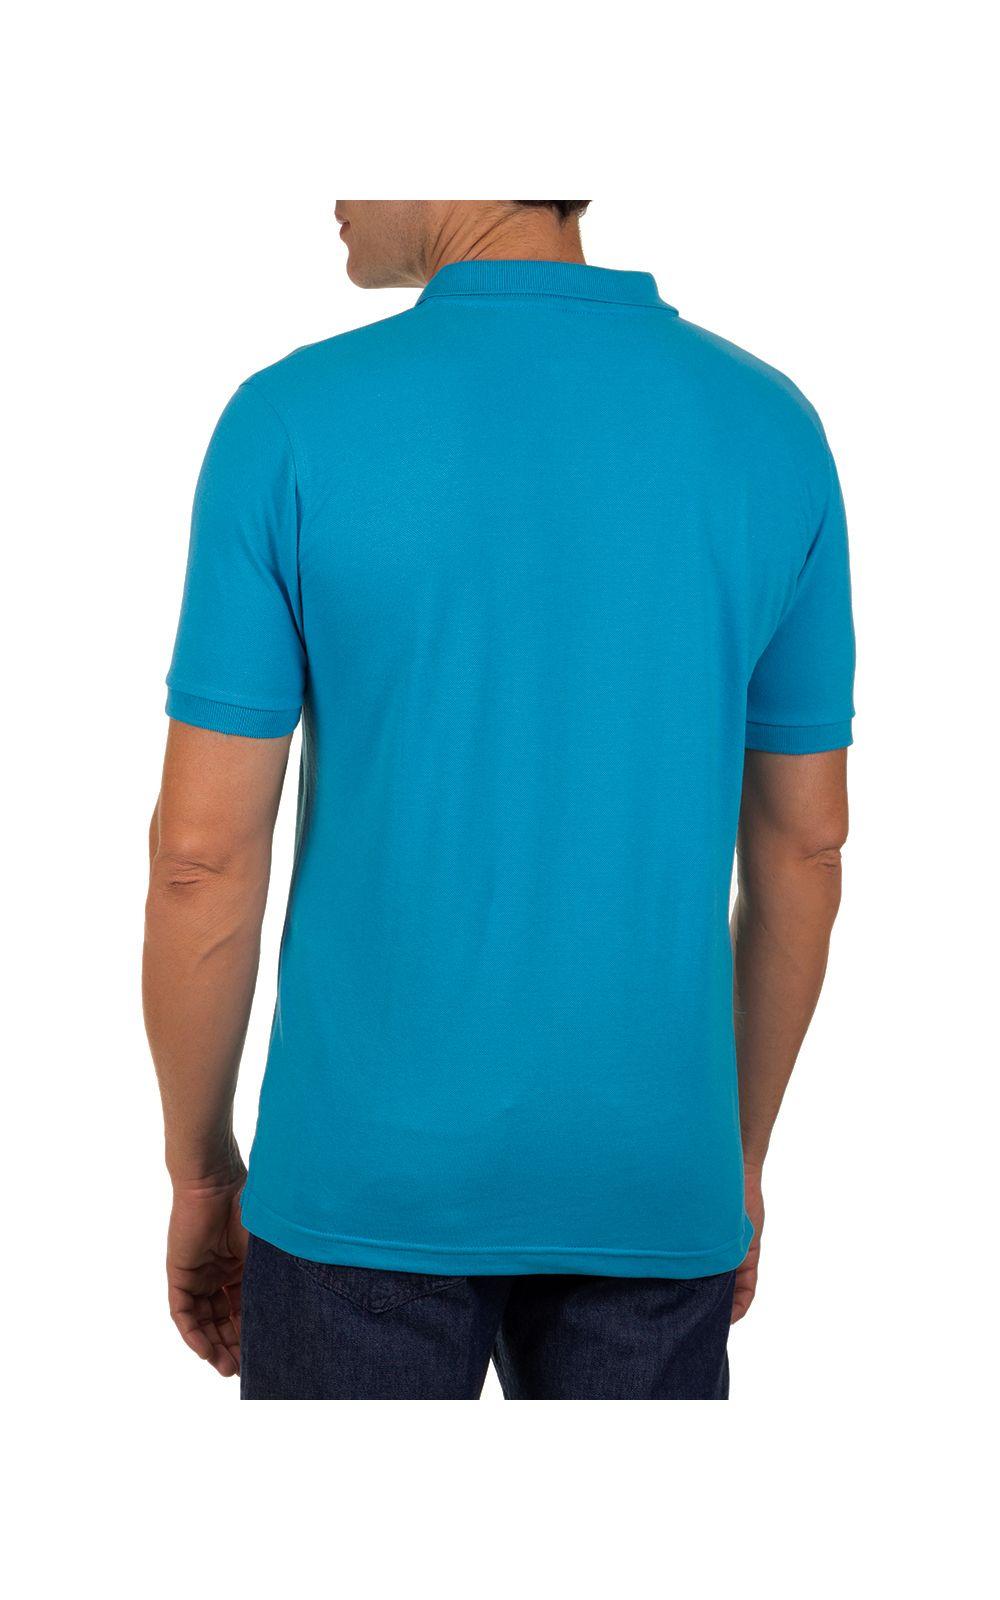 Foto 2 - Camisa Polo Masculina Azul Claro Lisa